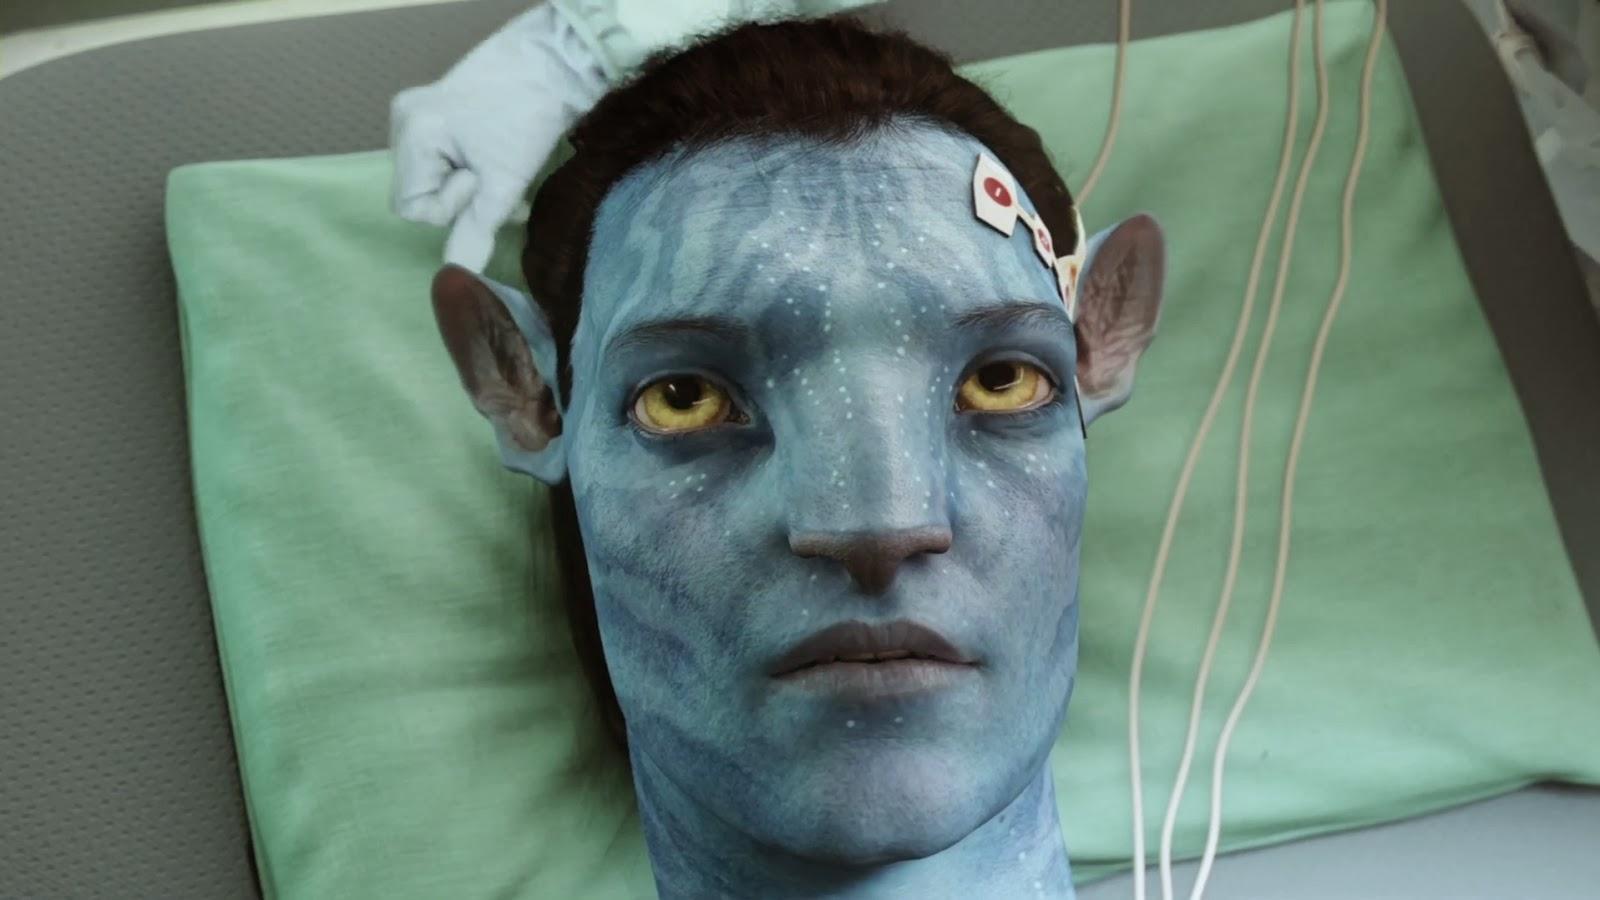 Avatar (2009) S4 s Avatar (2009)